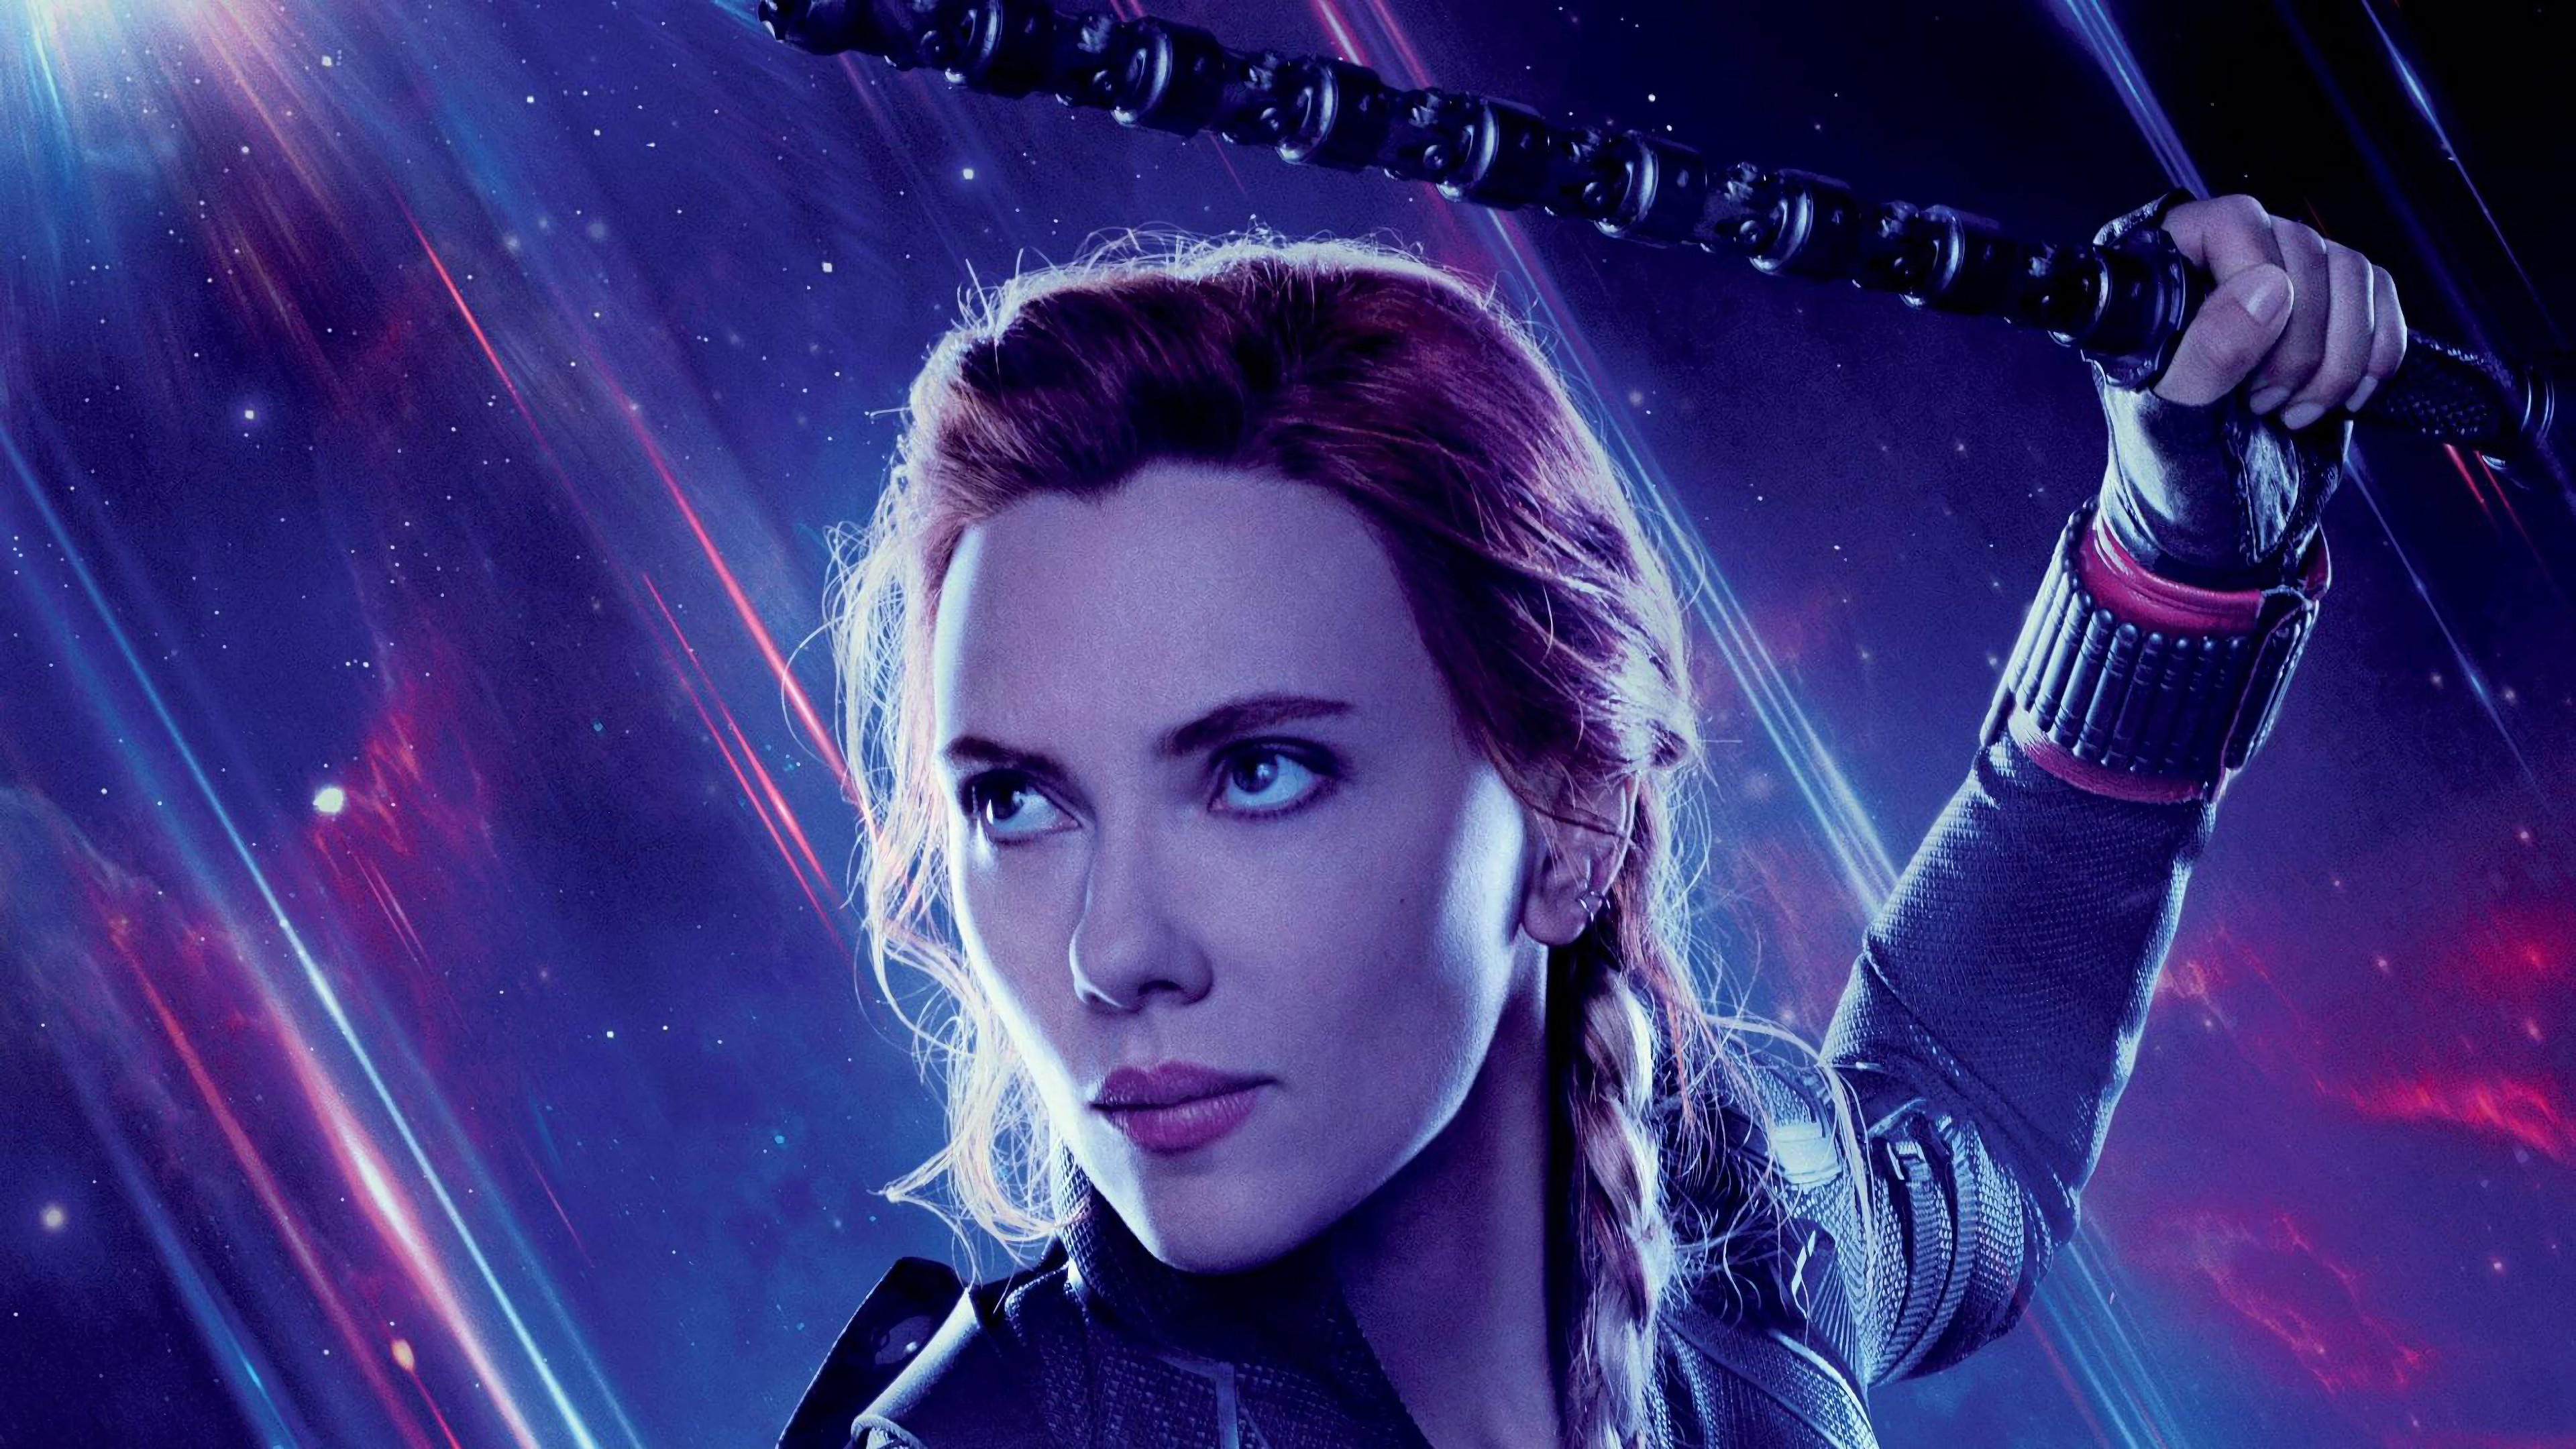 Avengers endgame black widow natasha romanoff 4k 84 - Natacha avenger ...